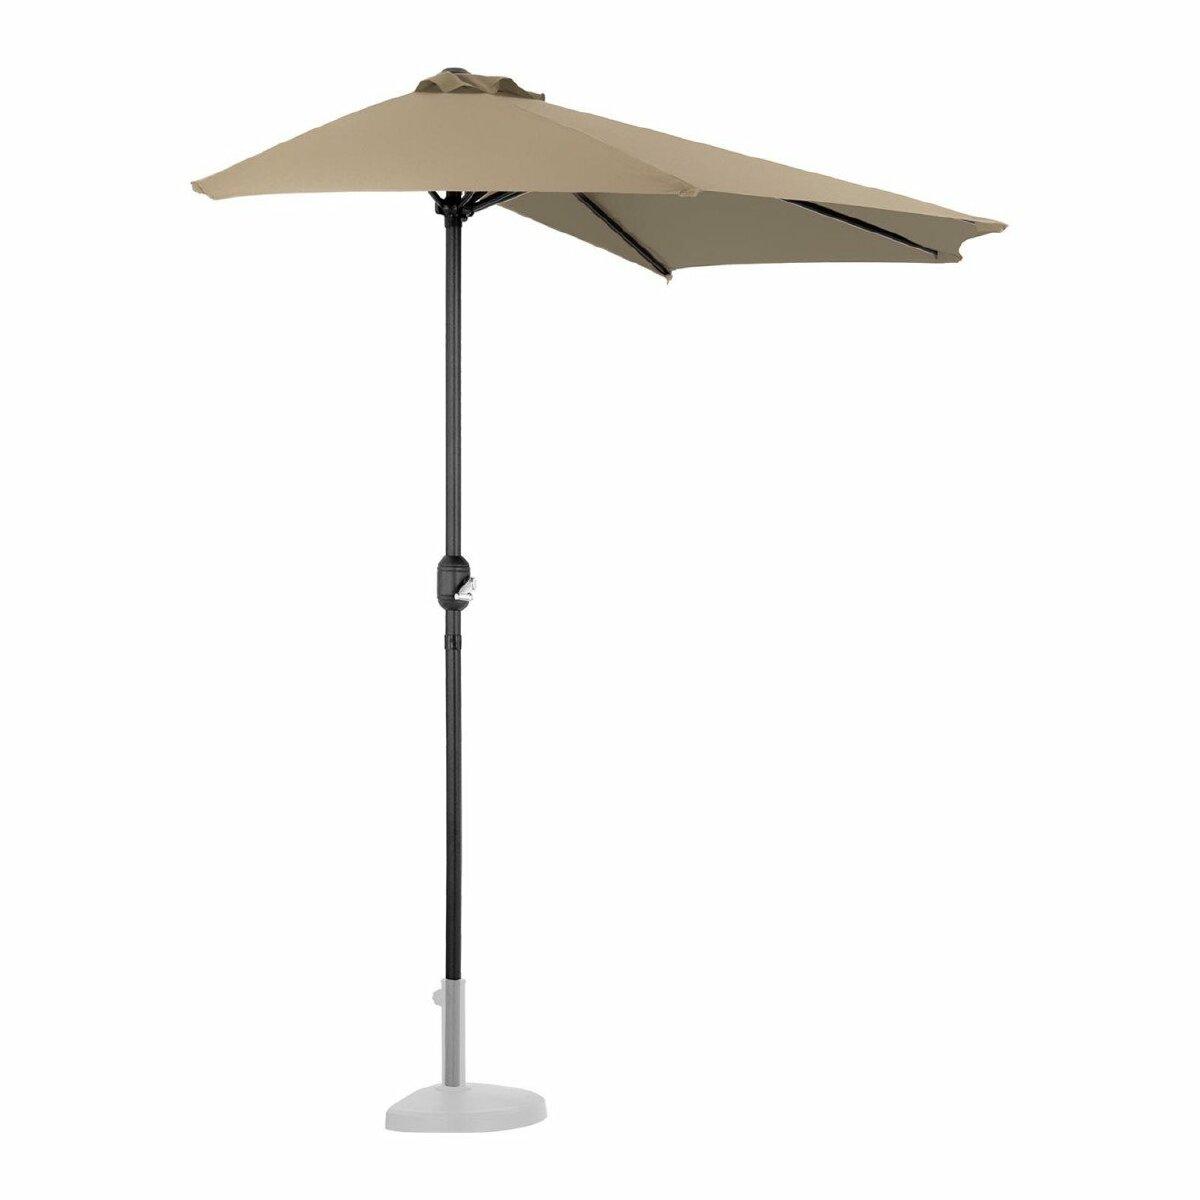 Helloshop26 Demi parasol de jardin meuble abri terrasse pentagonal 270 x 135 cm taupe 14_0001342